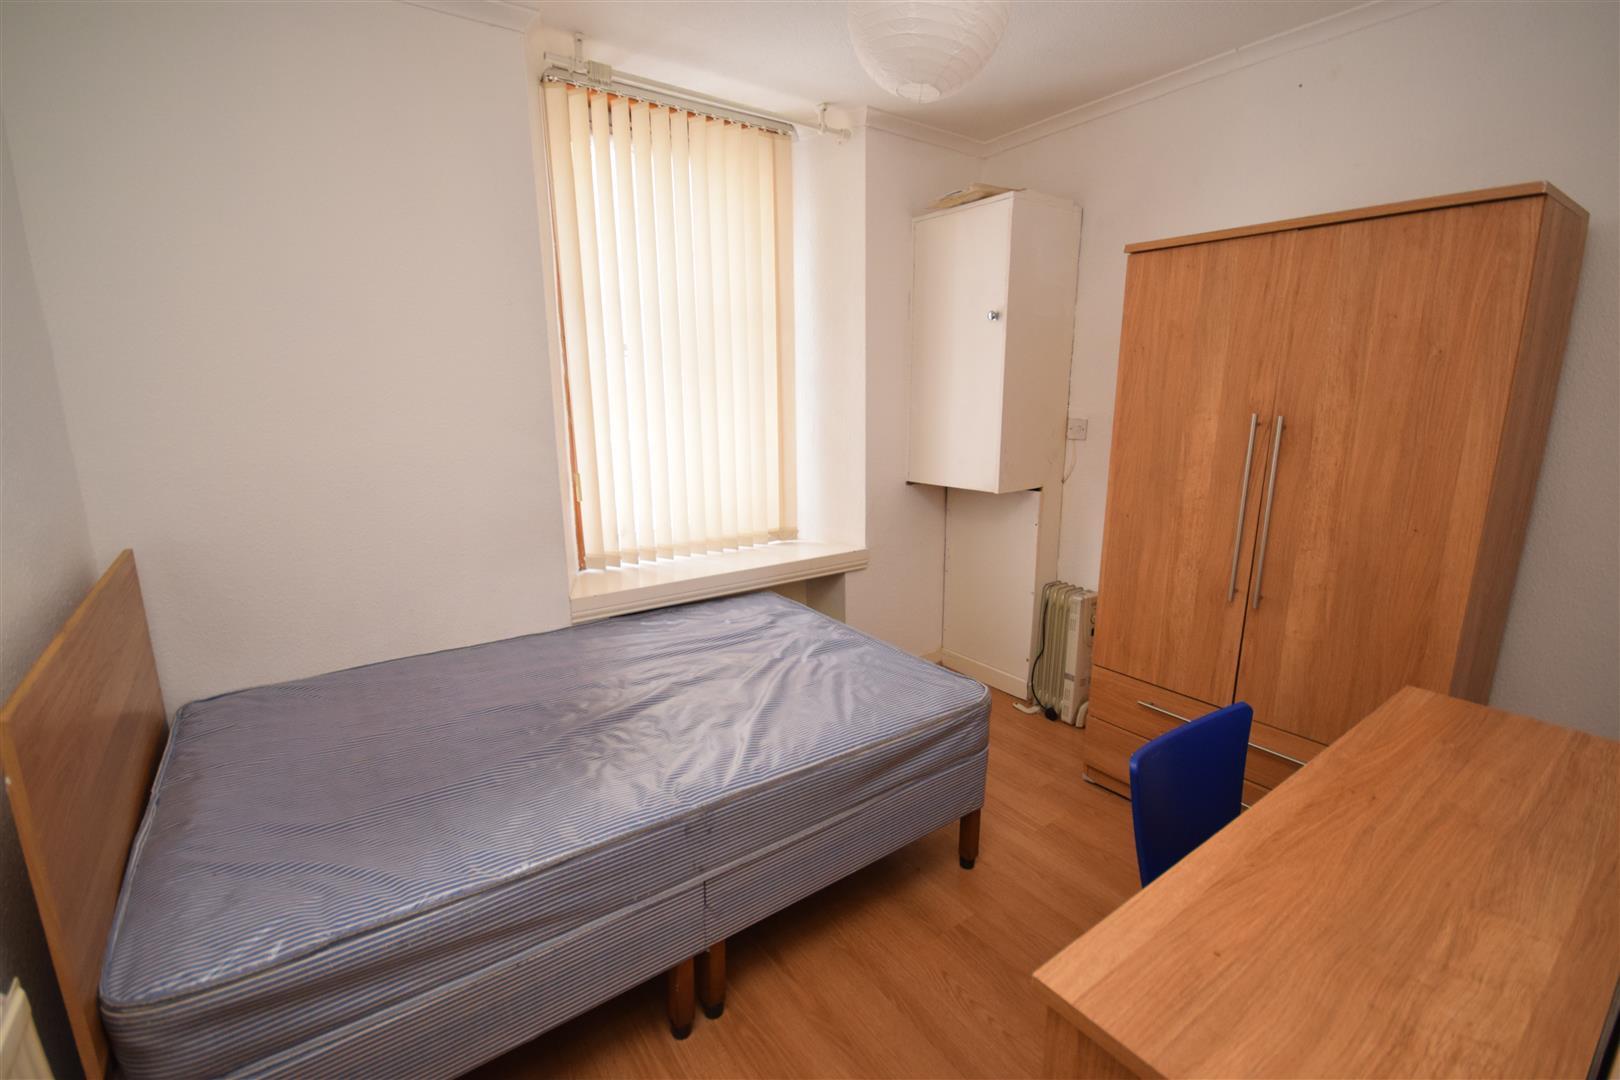 Ground Floor Flat, 4, Eassons Angle, Dundee, Angus, DD2 2LP, UK